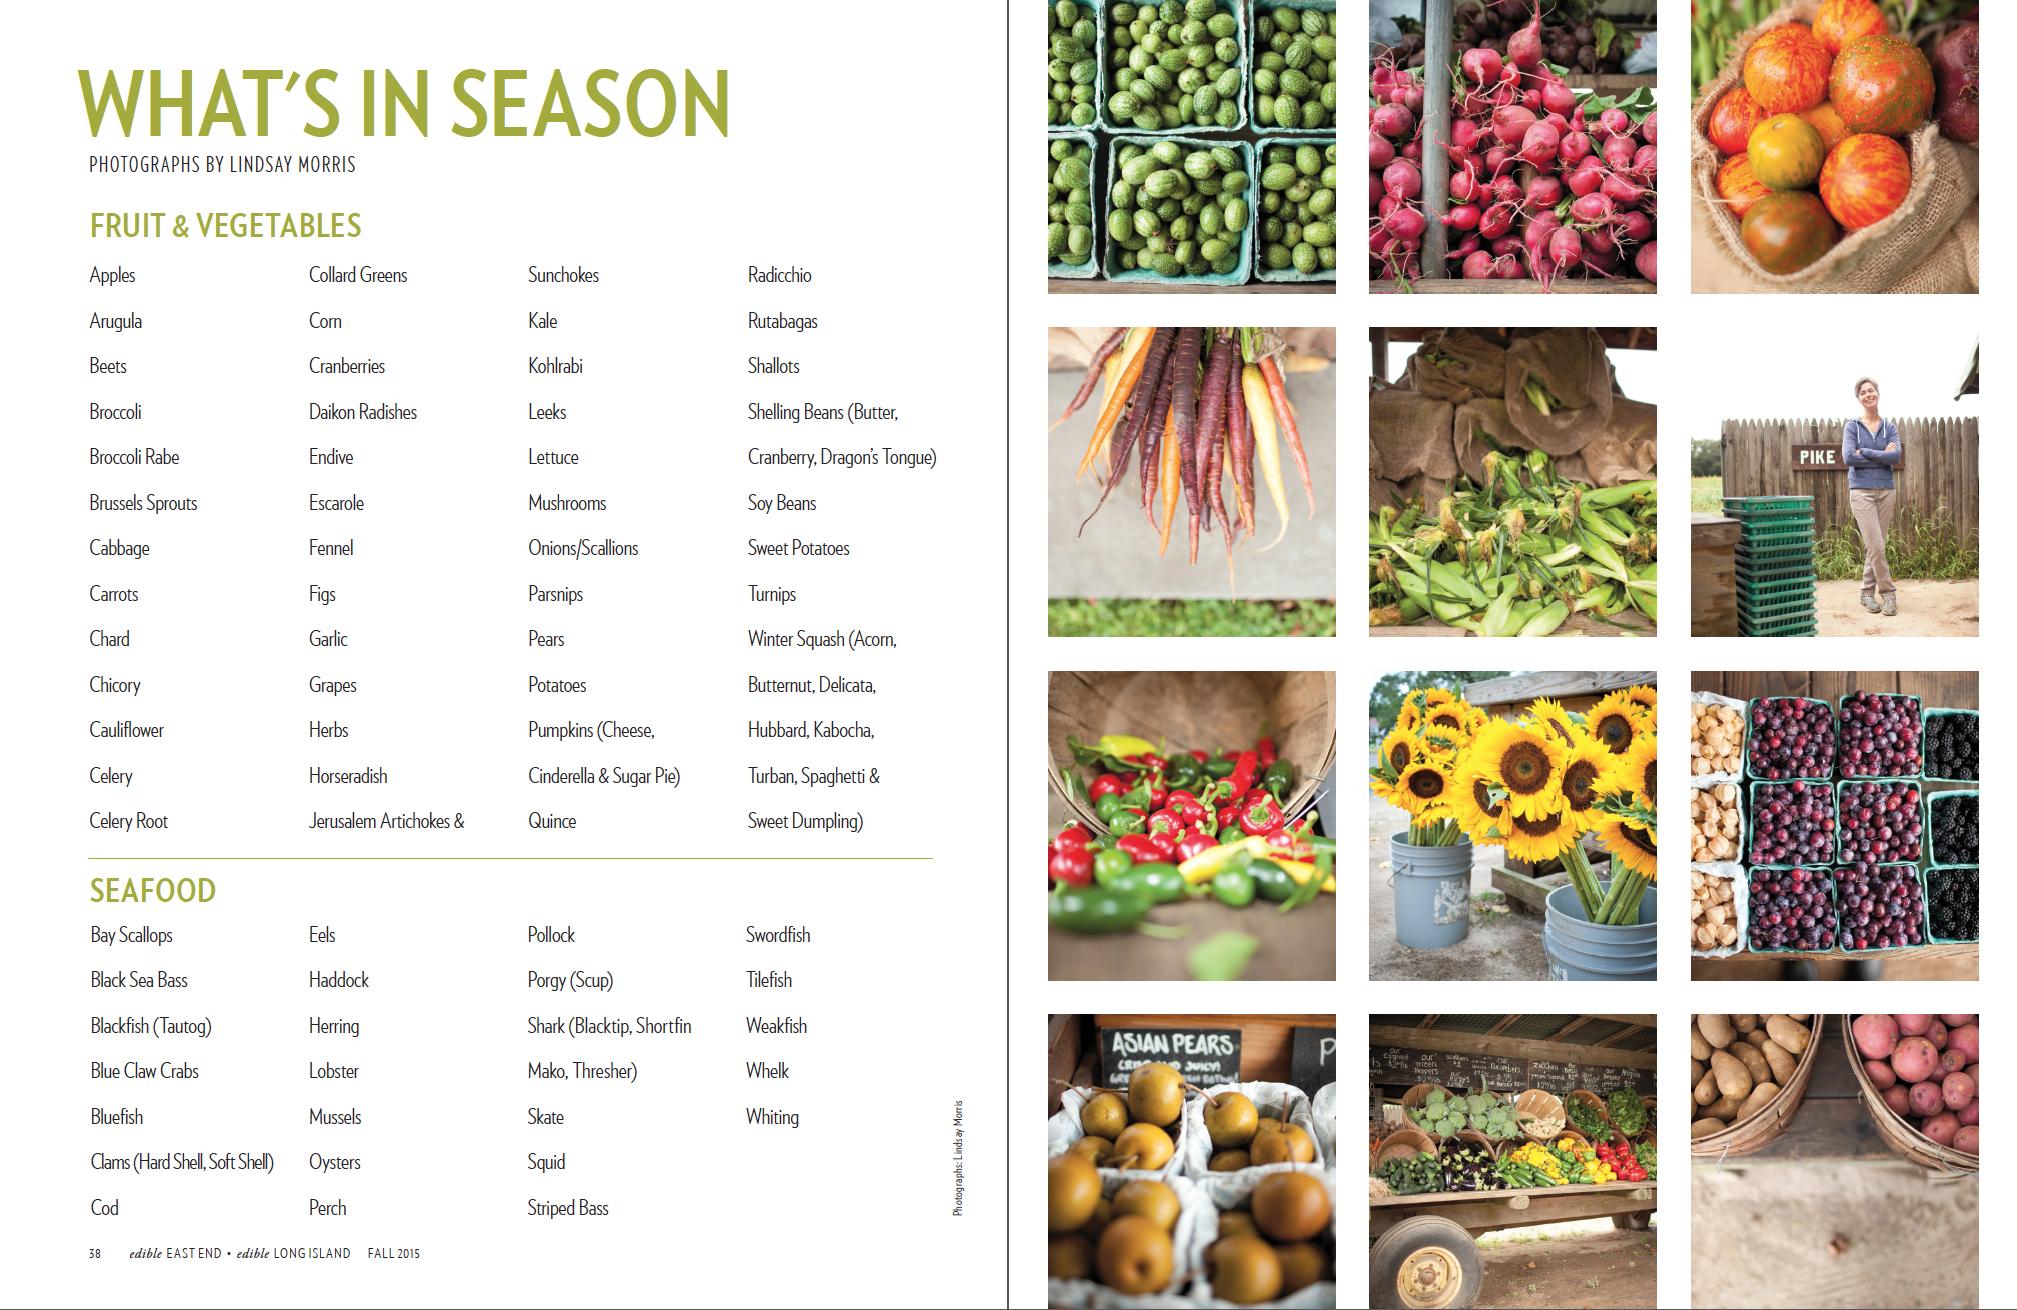 What's In Season List